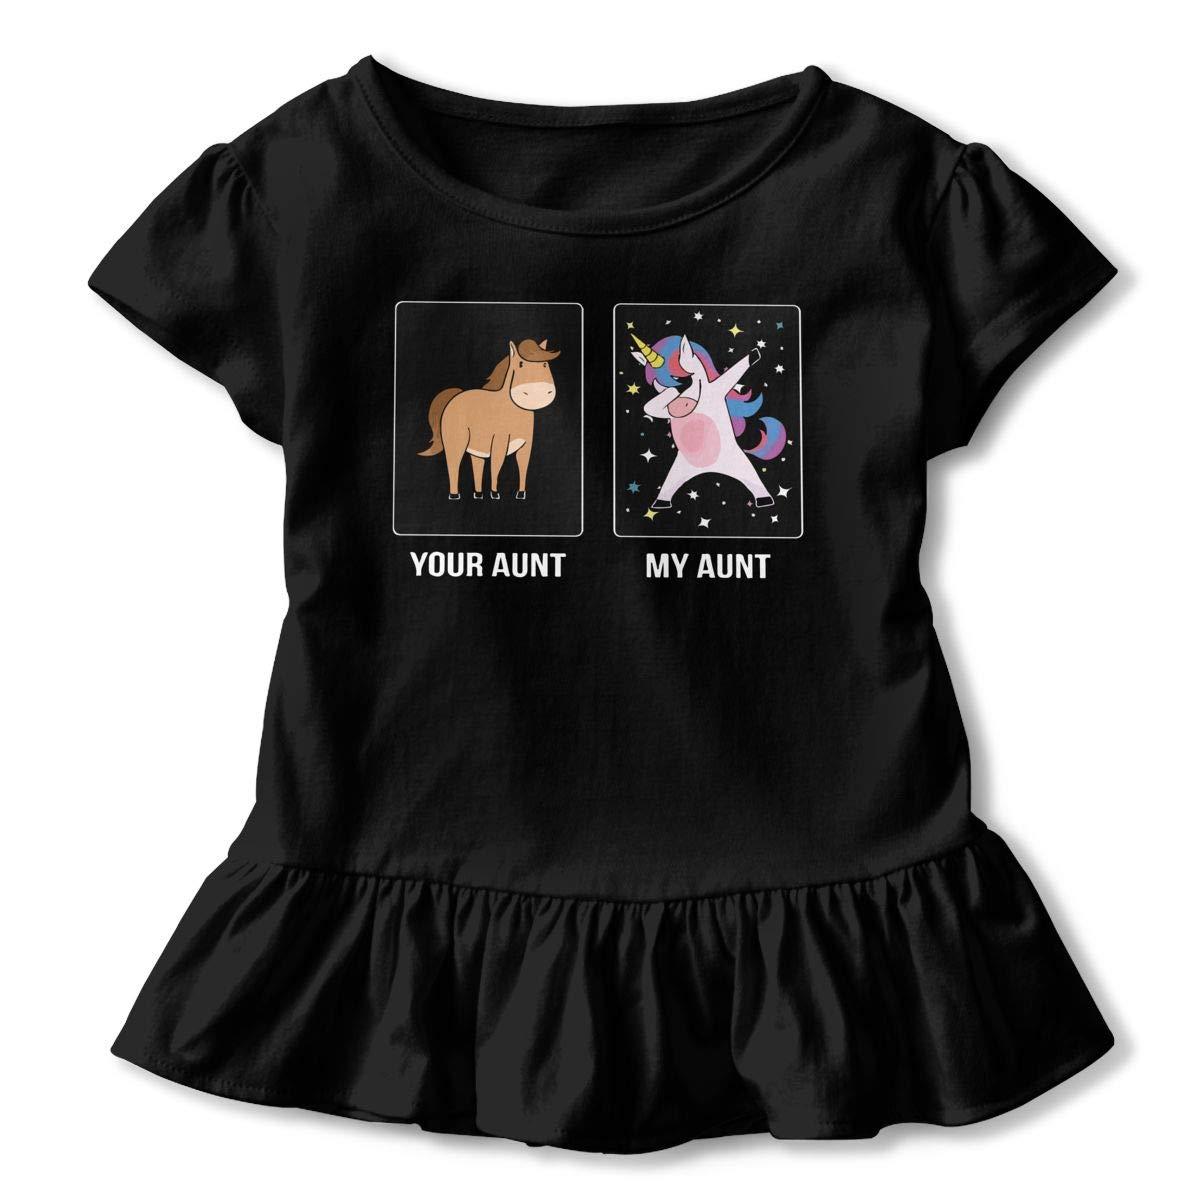 CZnuen Unicor Baby Girls Basic Short Puff Sleeve Round Neck Ruffle T-Shirt